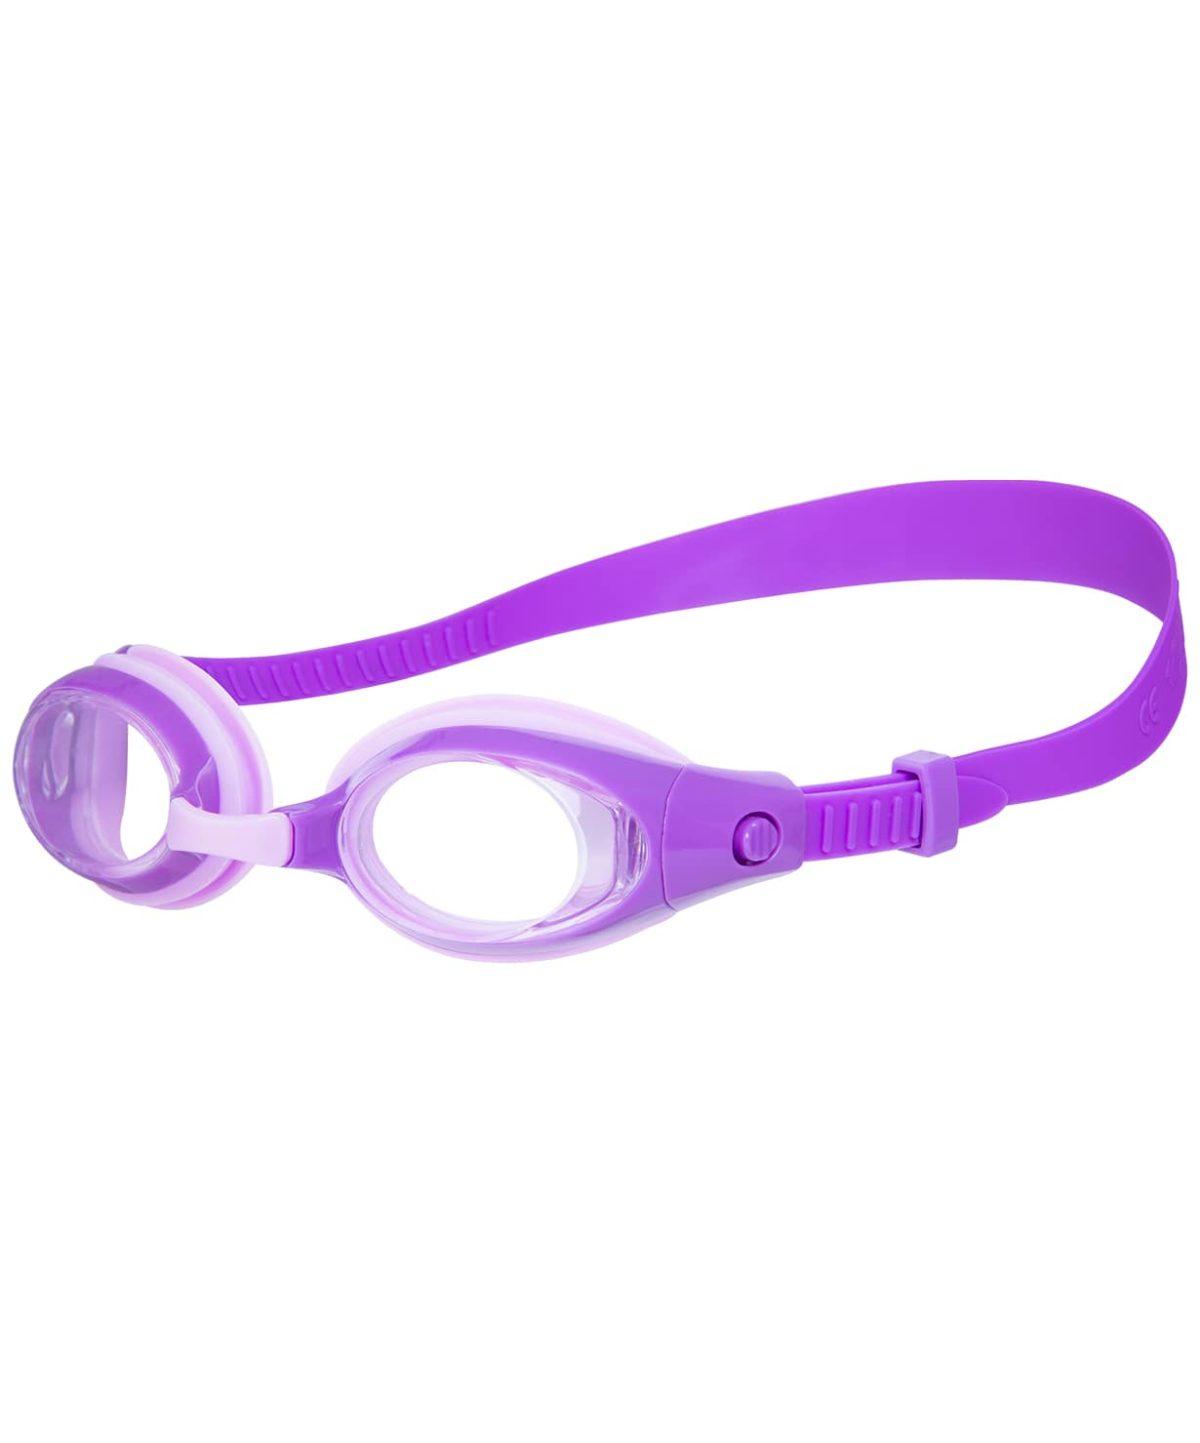 25DEGREES Flappy Pink/Purple Очки для плавания детские  17337 - 1